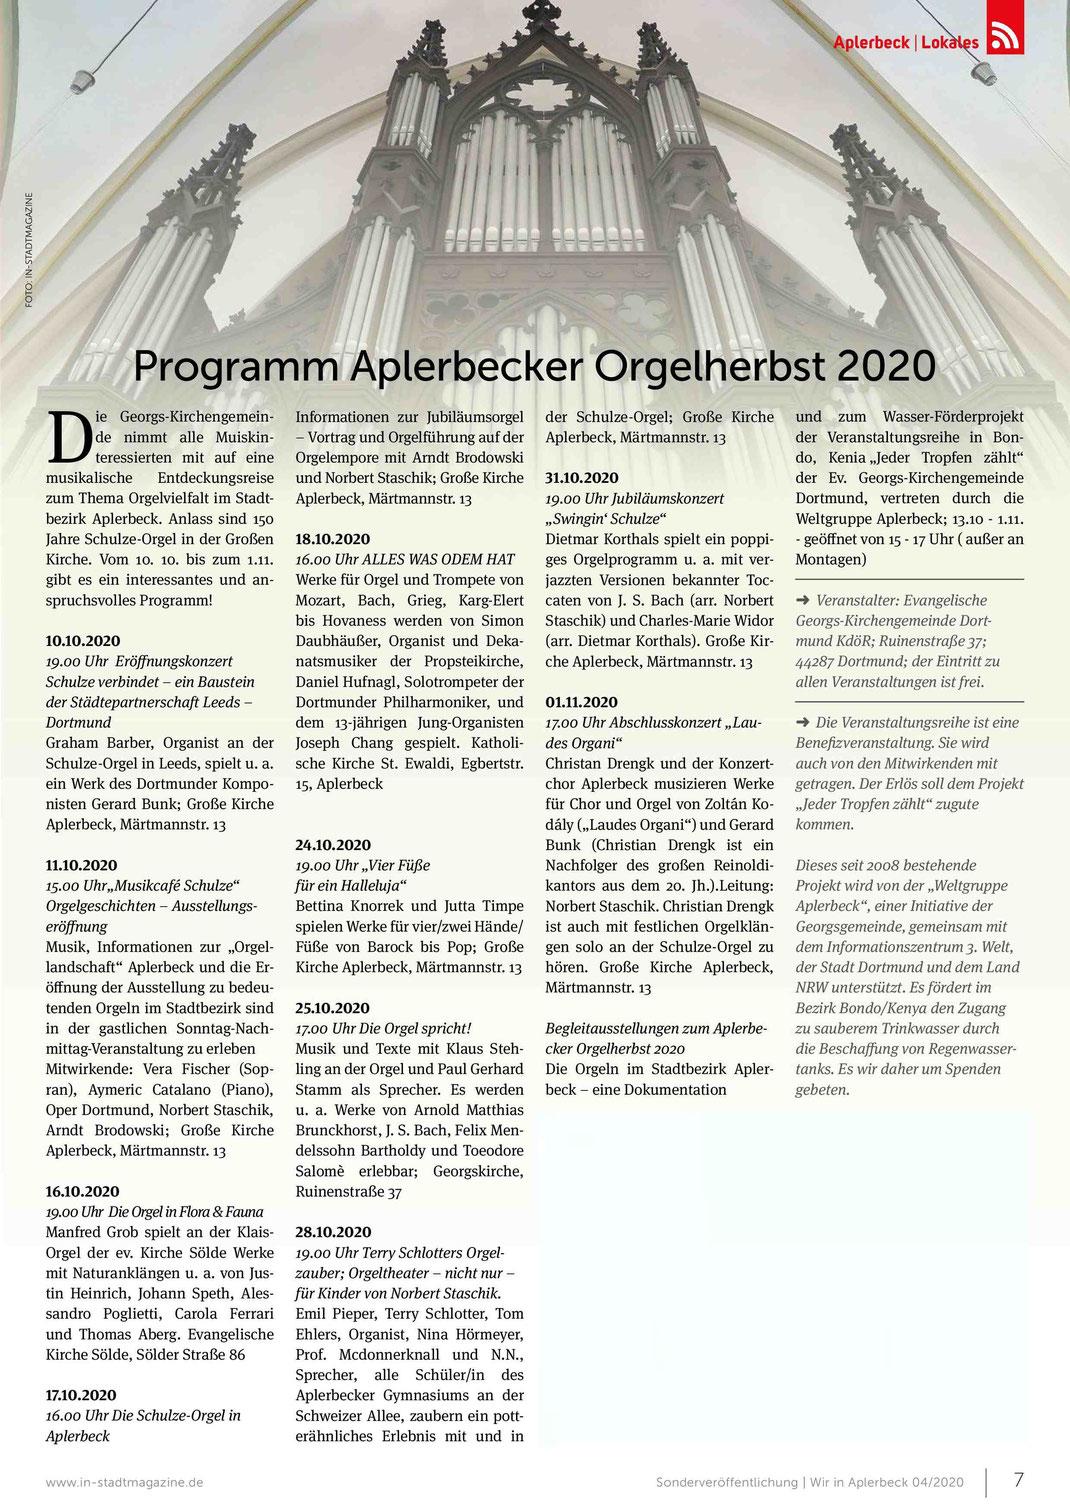 IN-Stadtmagazine